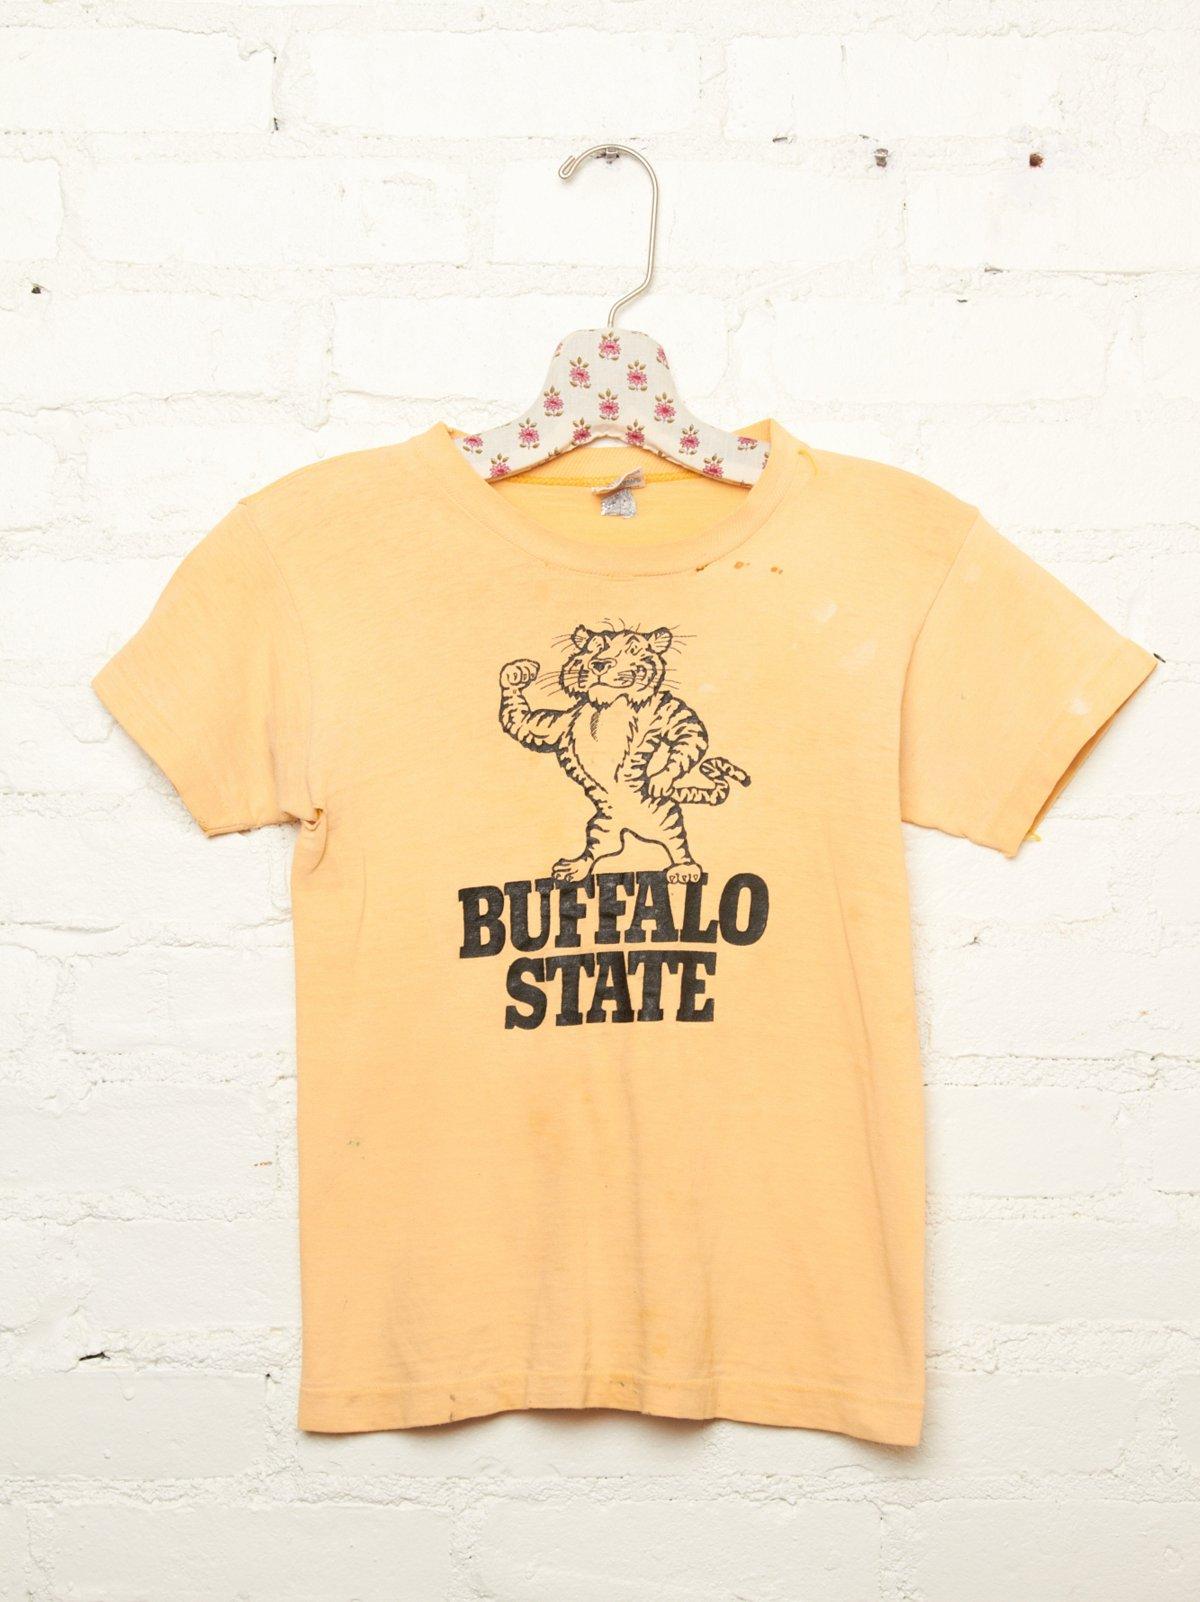 Vintage Buffalo State Tee